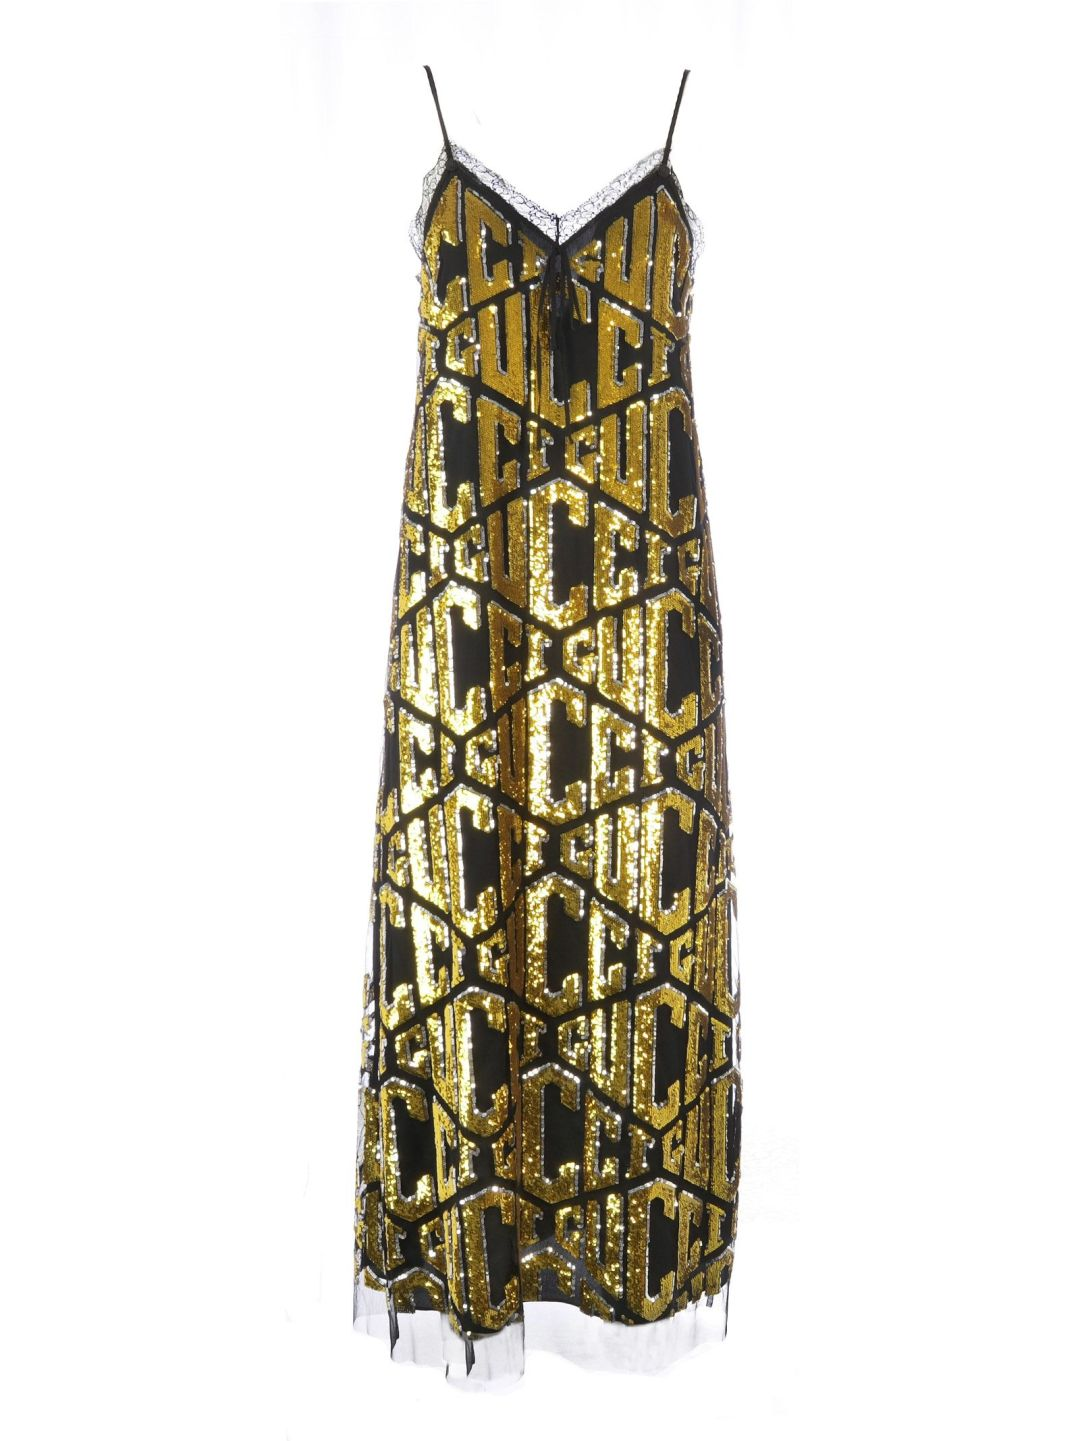 5f0397abe Gucci Game Sequins Slip Dress – Italist.com US – $4,919.49